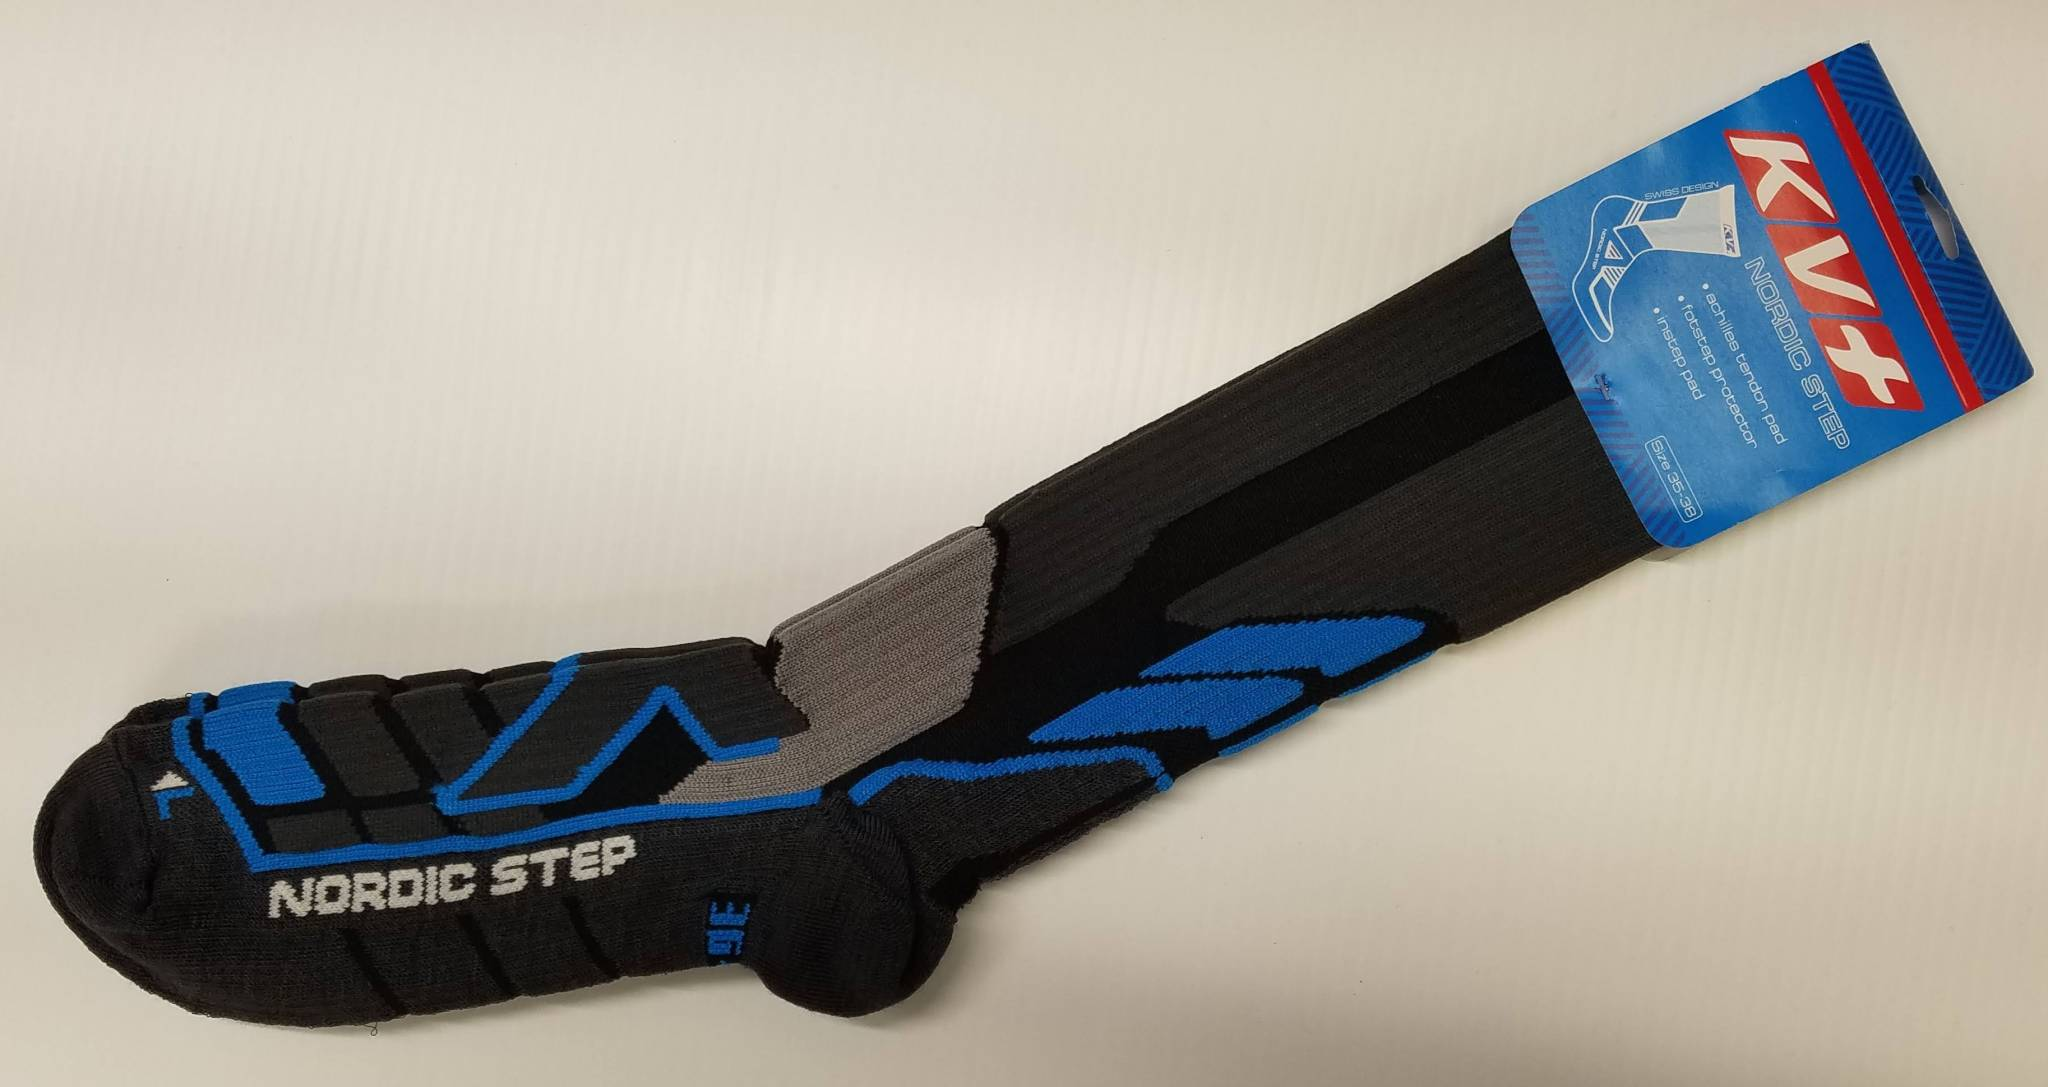 Form-fitting performance socks, so comfy.